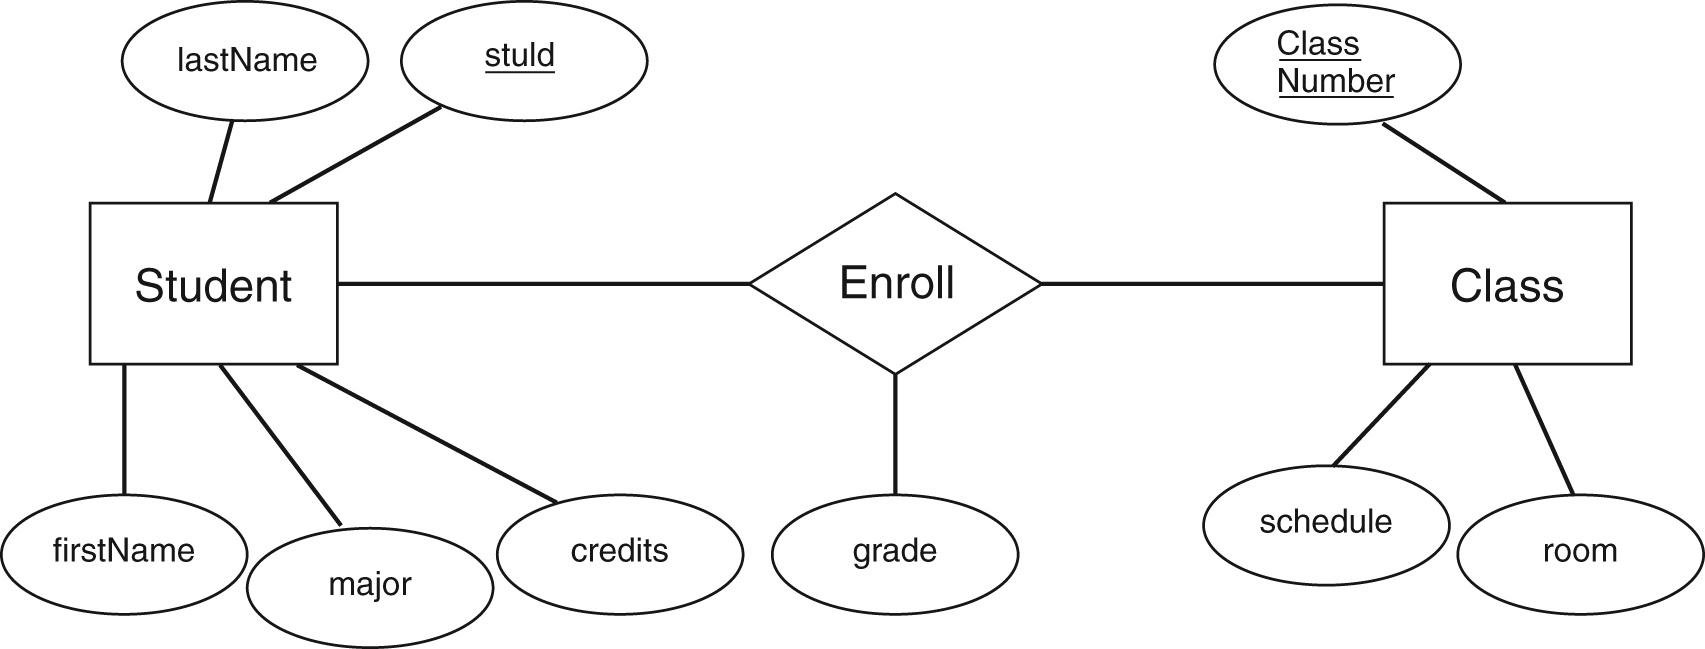 Er Diagram Dbms Examples - 9.ulrich-Temme.de • throughout Er Diagram Examples Hospital Dbms